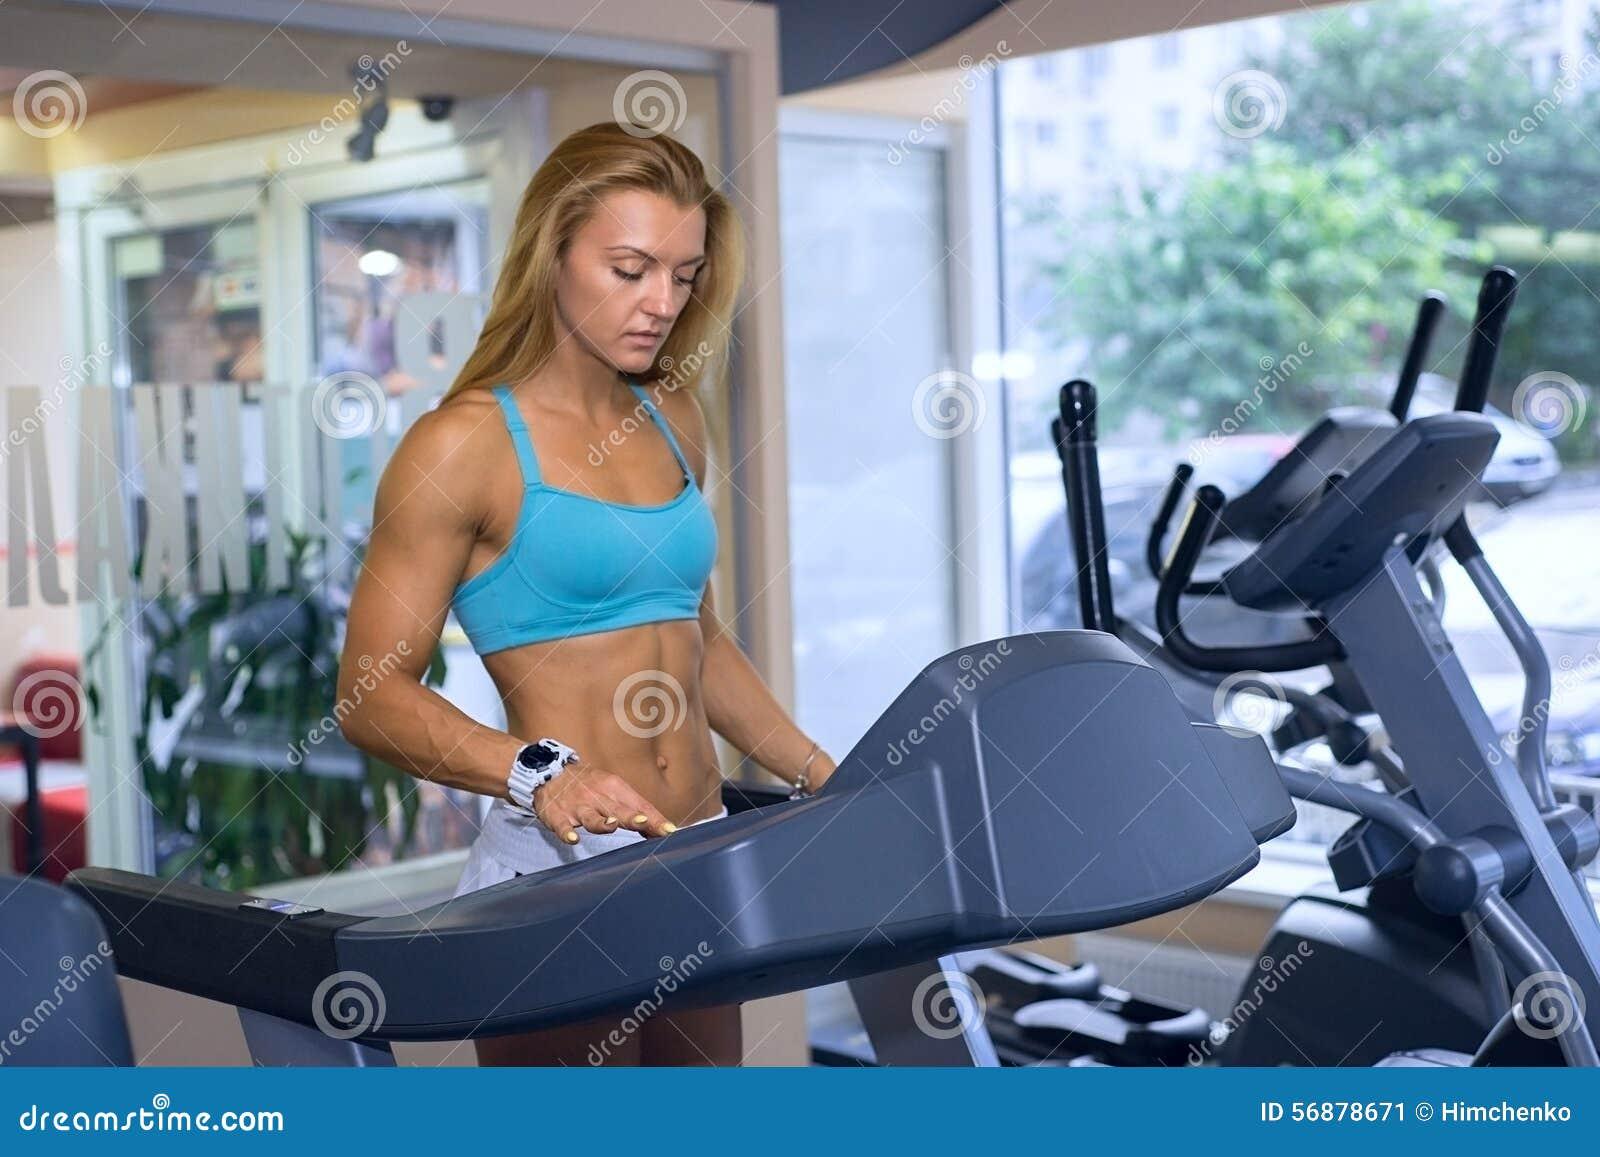 La donna prepara cardio in palestra